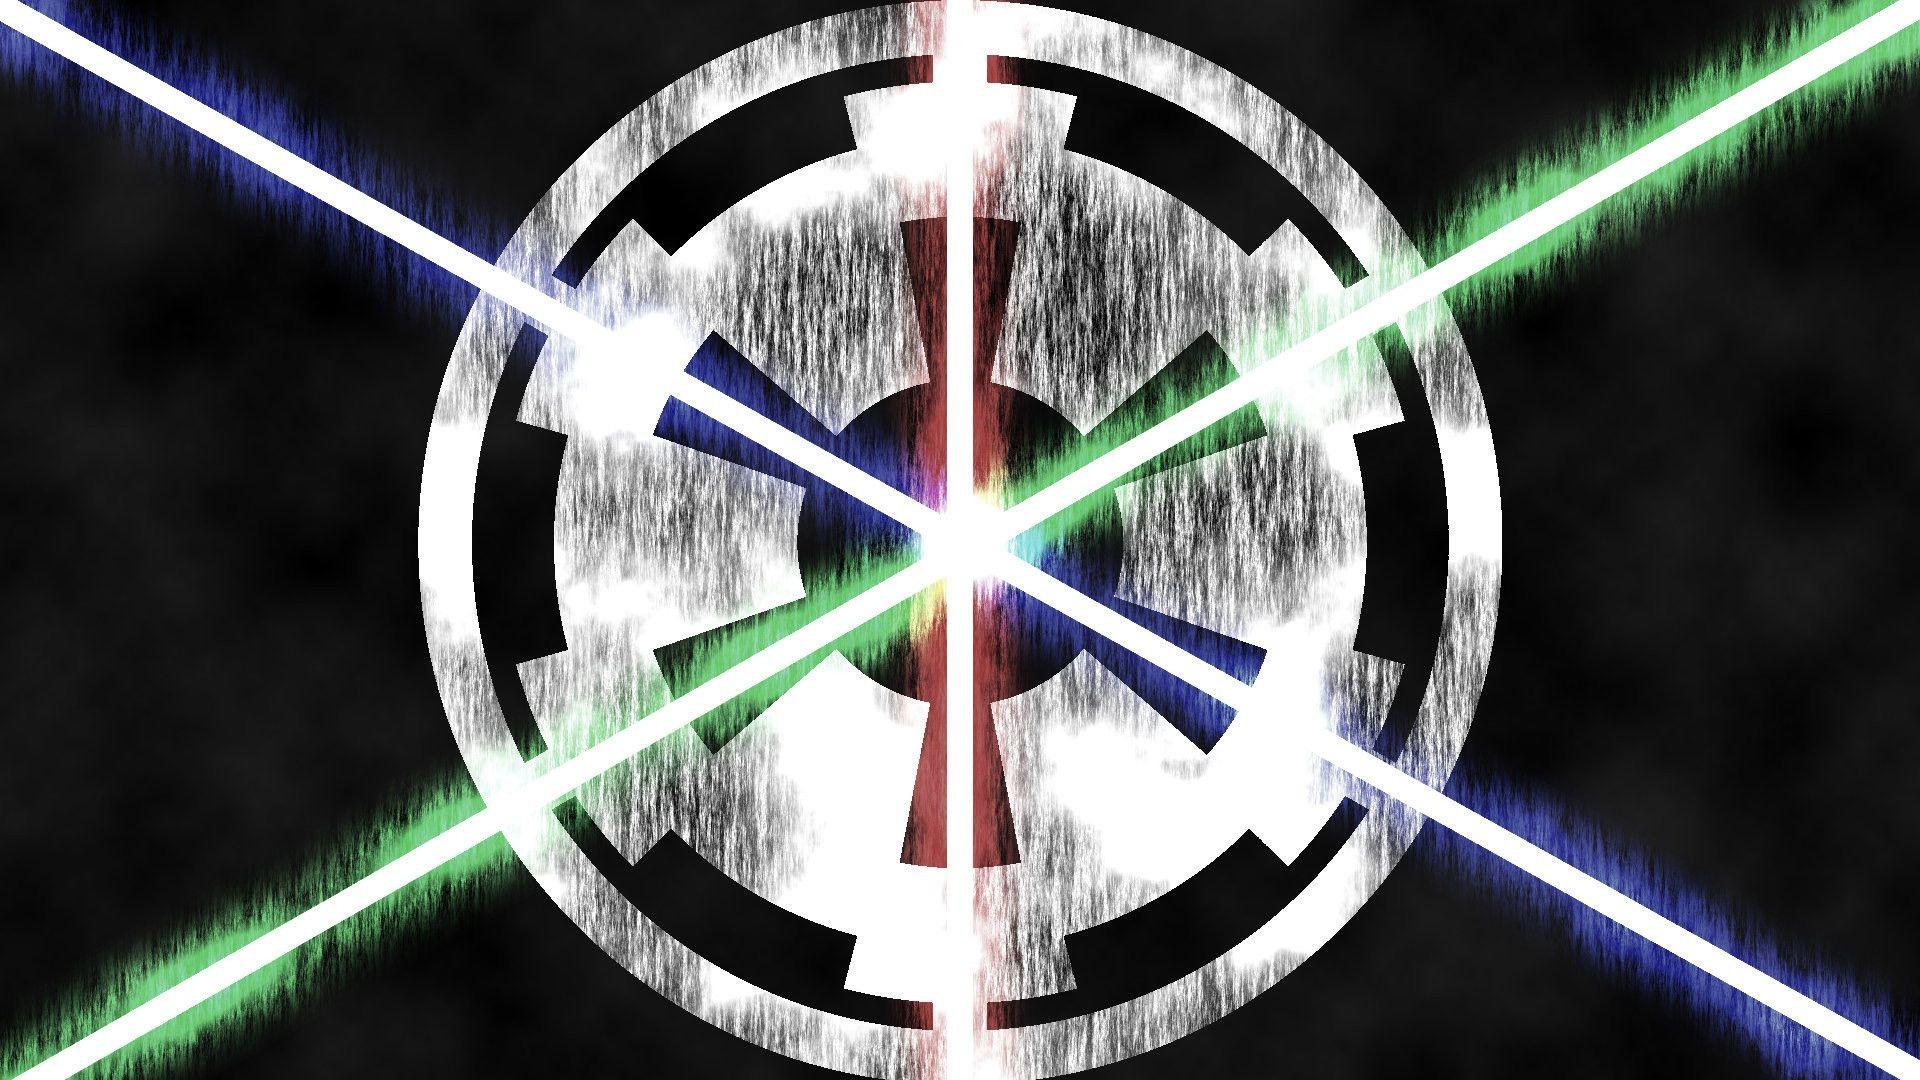 Star Wars Empire Picture For Desktop Wallpaper 1920 x 1080 px 623.08 KB  empire lightsaber jedi